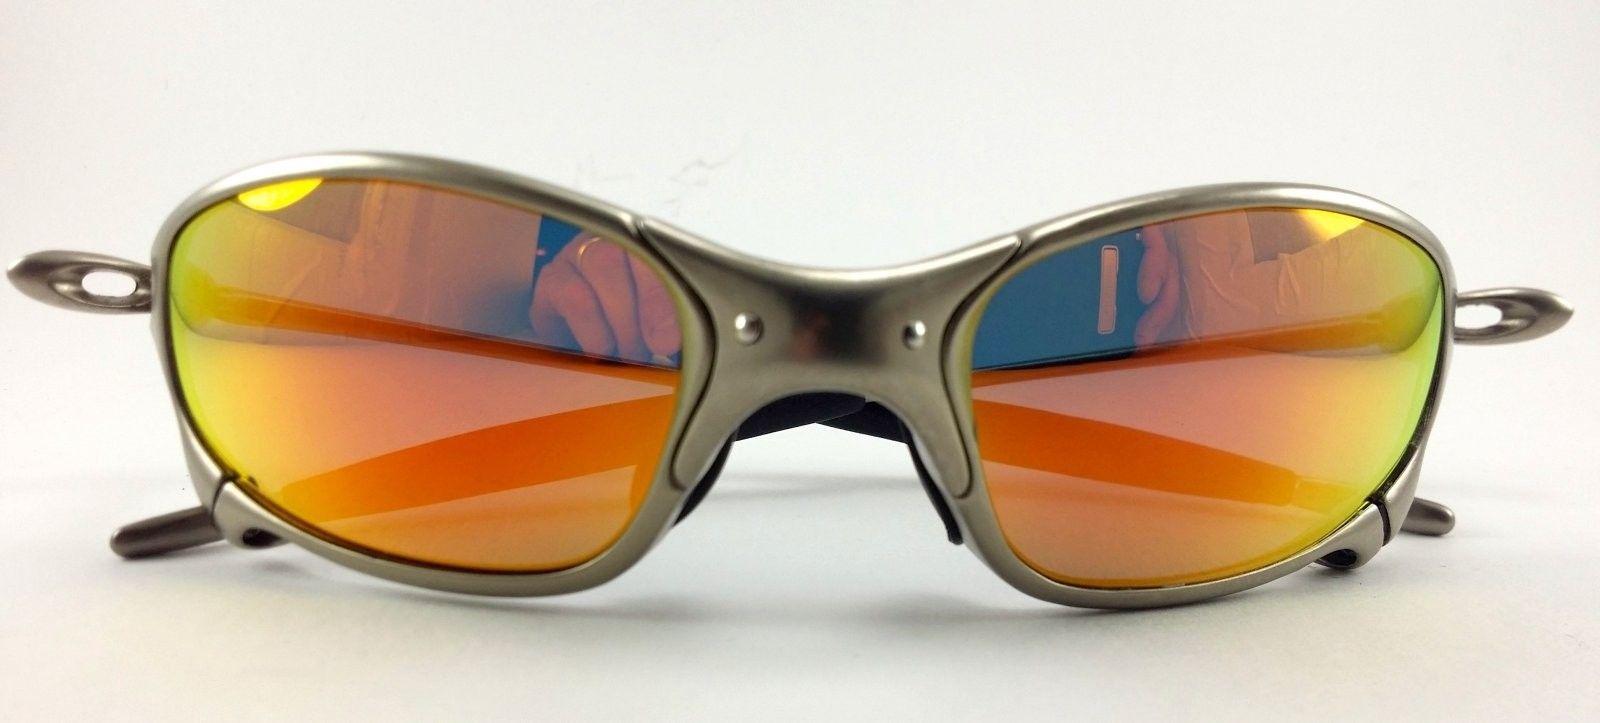 Like New Plasma Juliet W/ New RUBY Lenses *$OLD* - Fire1.jpeg